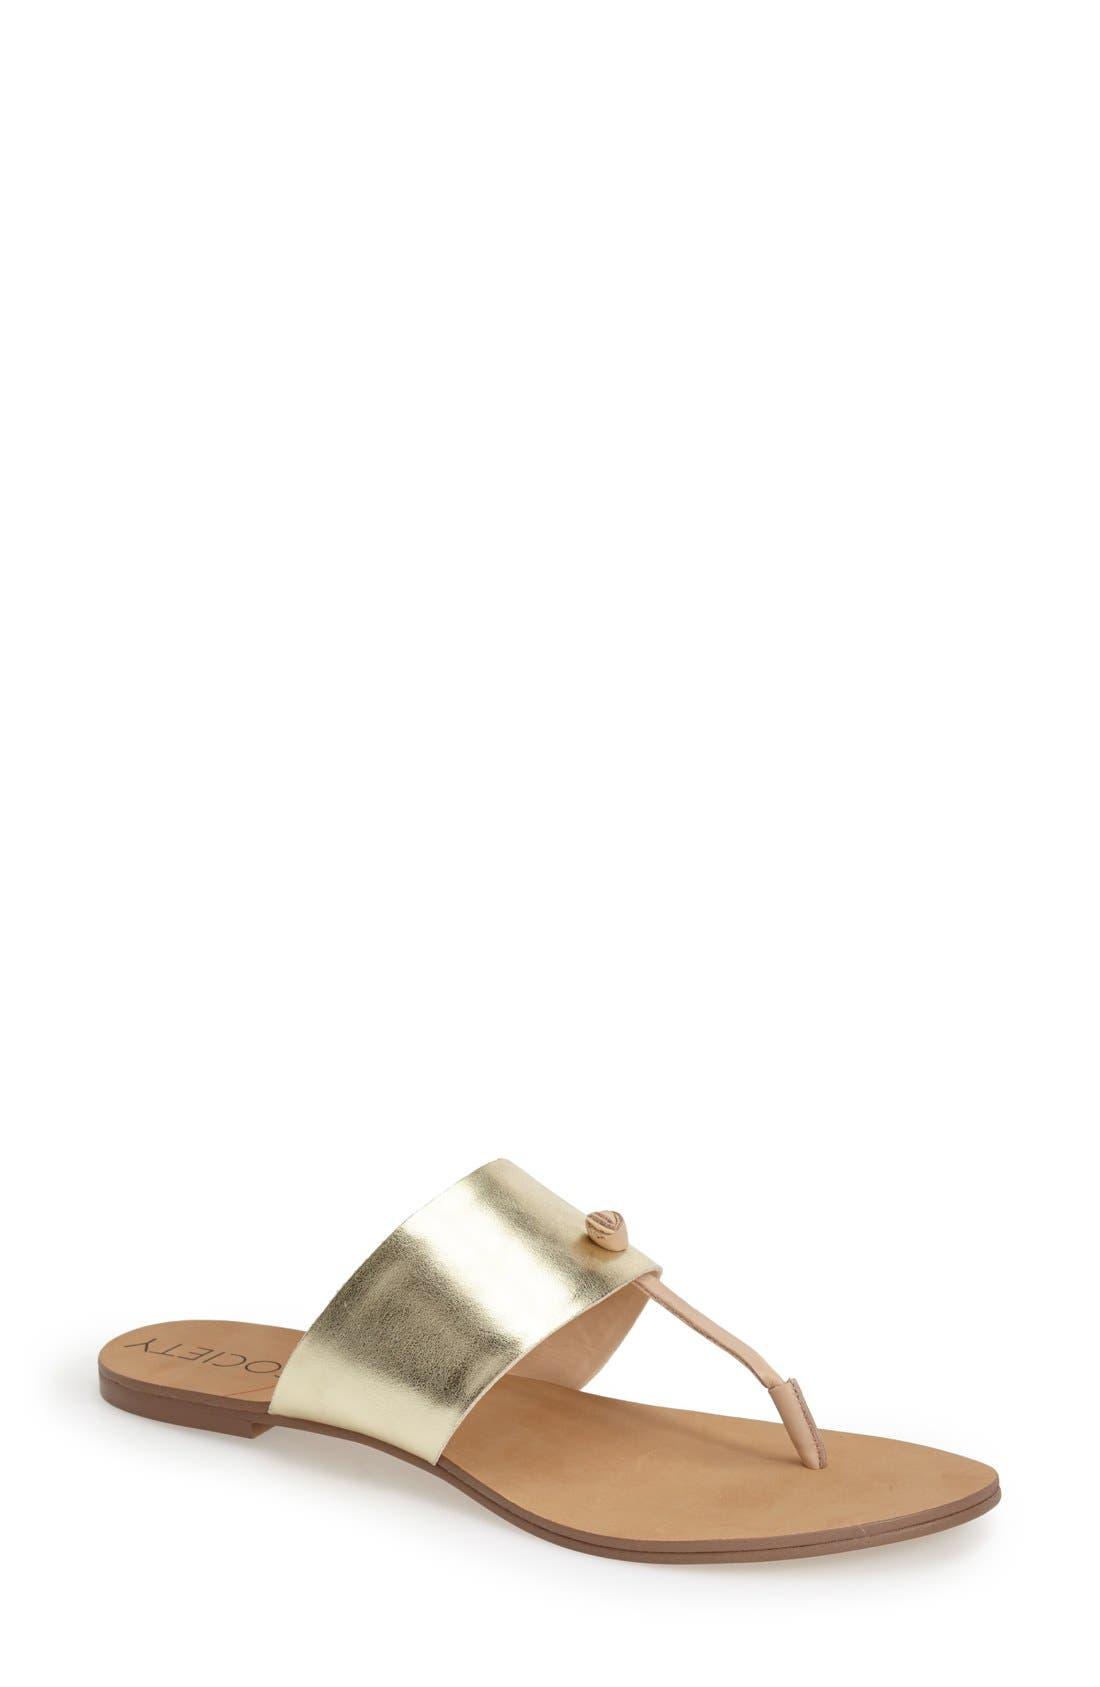 Alternate Image 1 Selected - Sole Society 'Sarena' Thong Sandal (Women)